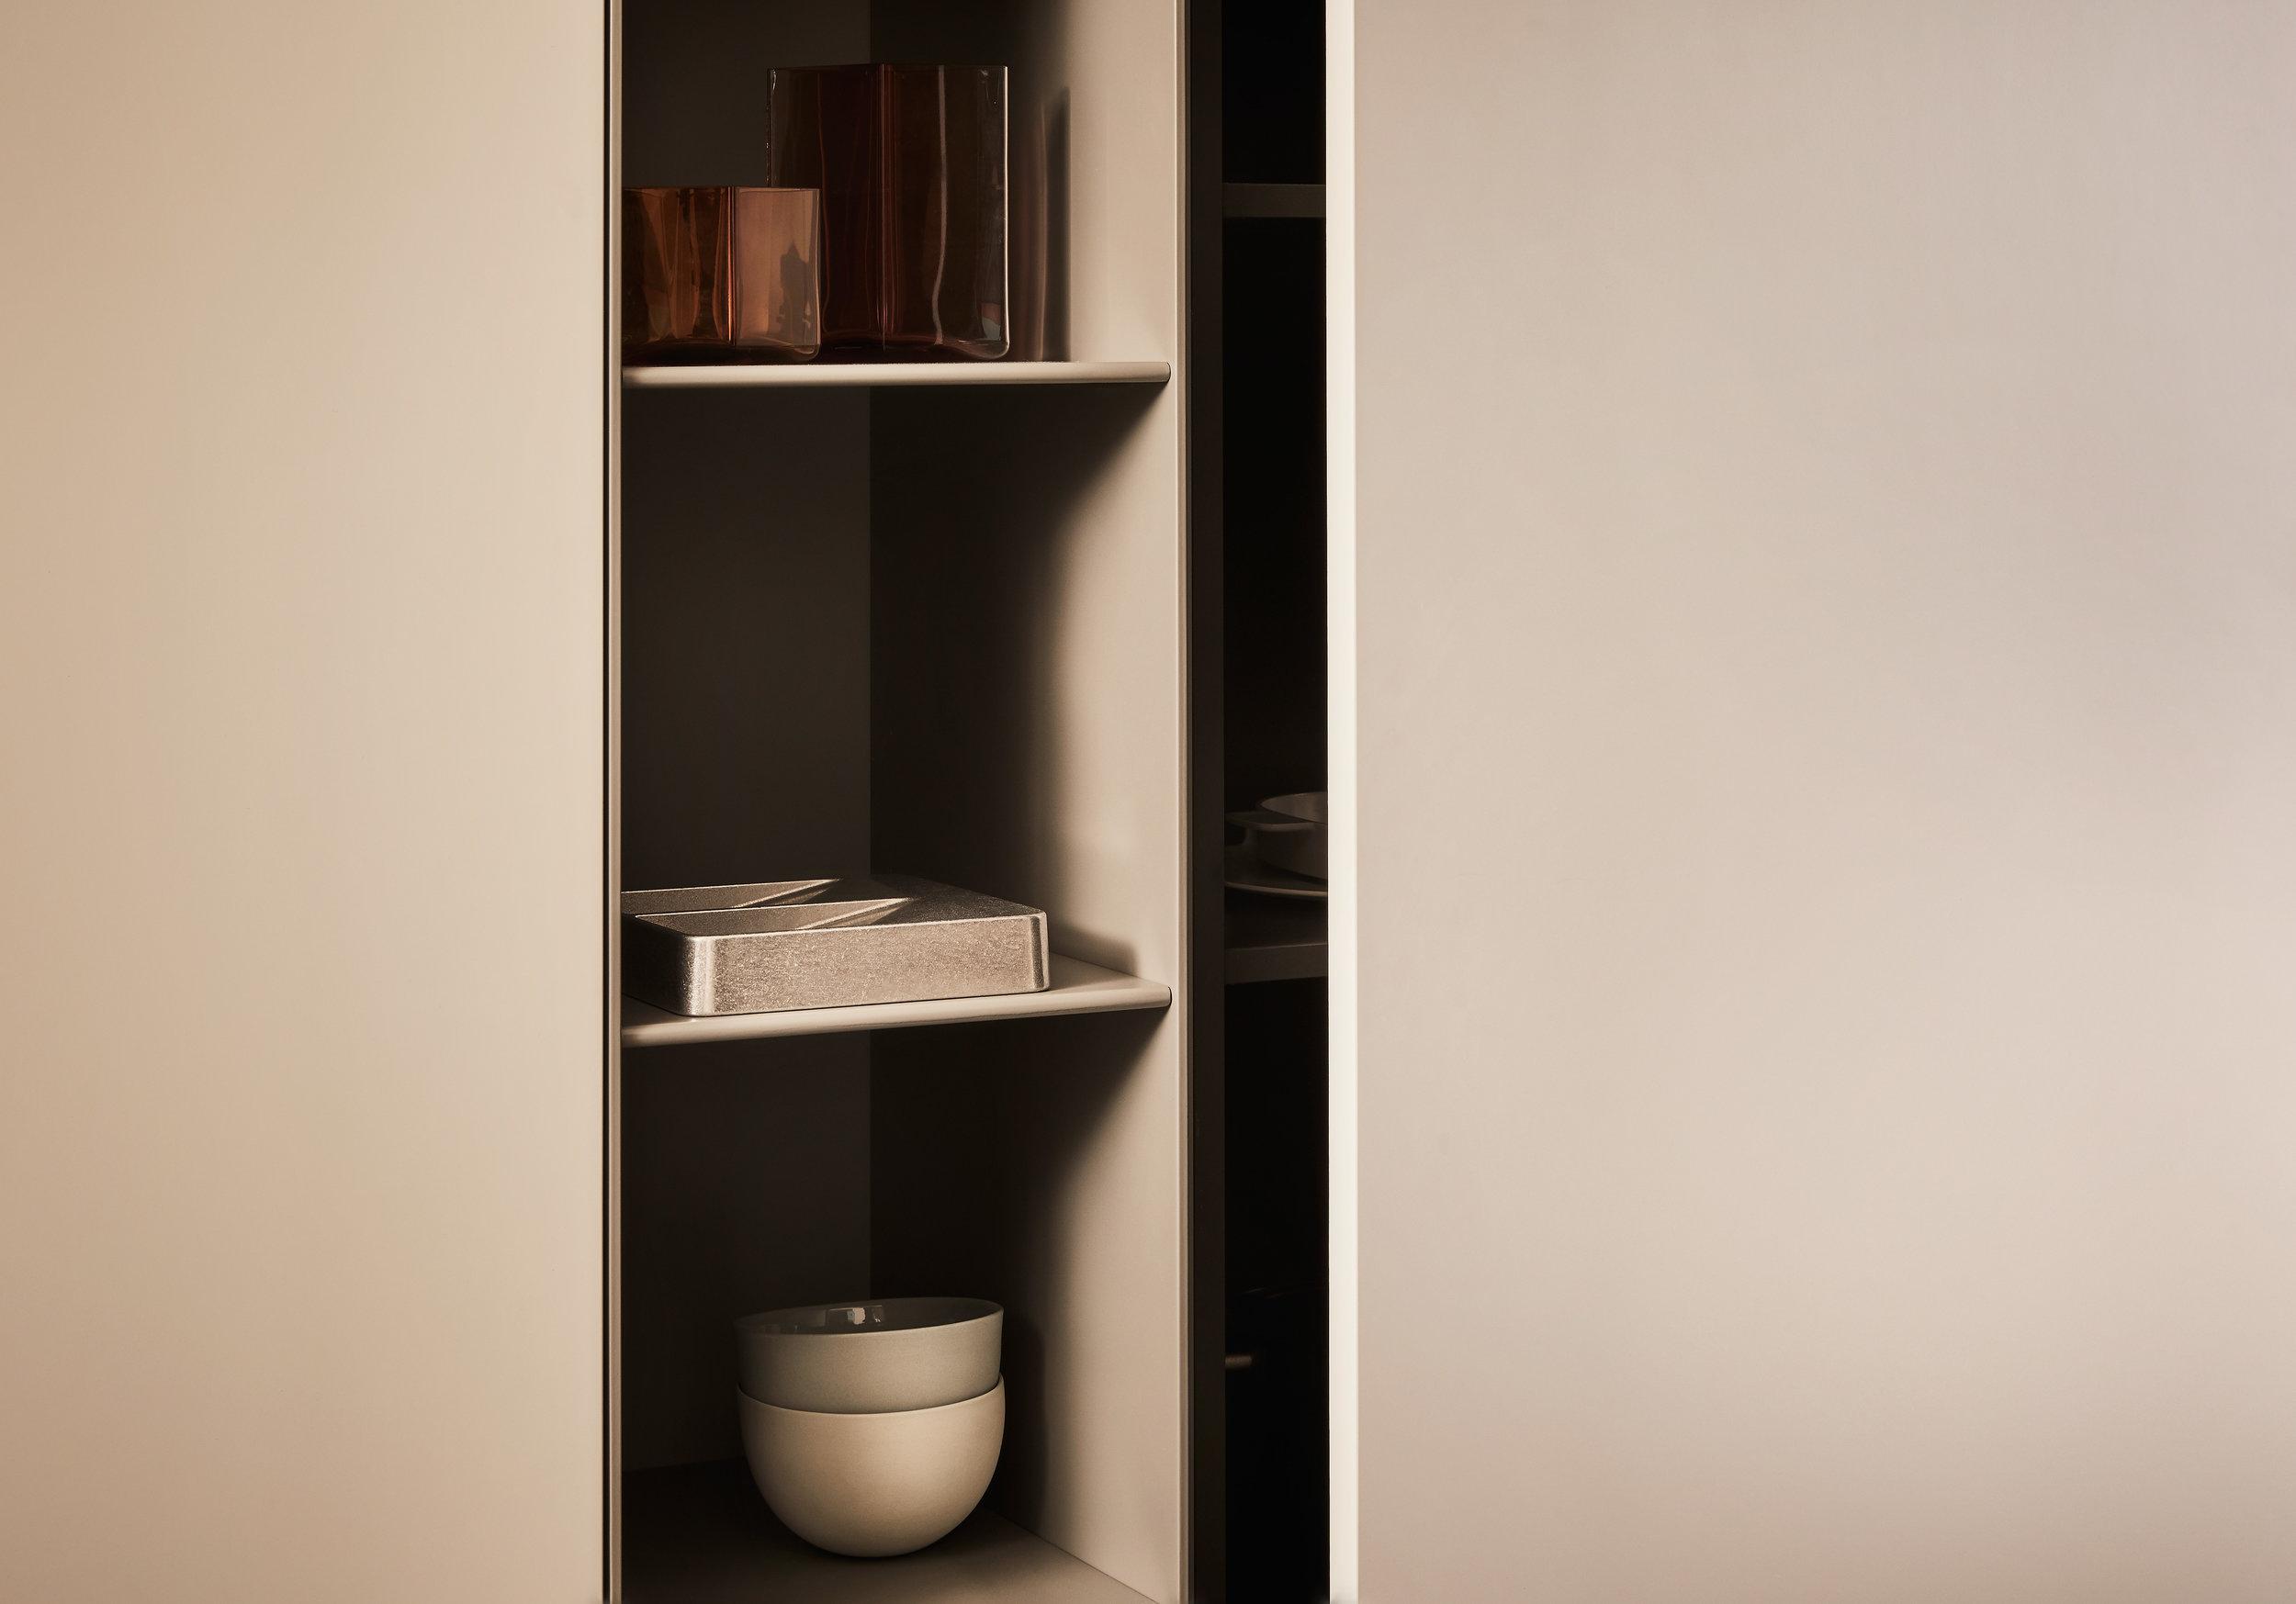 Tableau Cantilever DesignOffice Kitchen System Australia (8).jpg